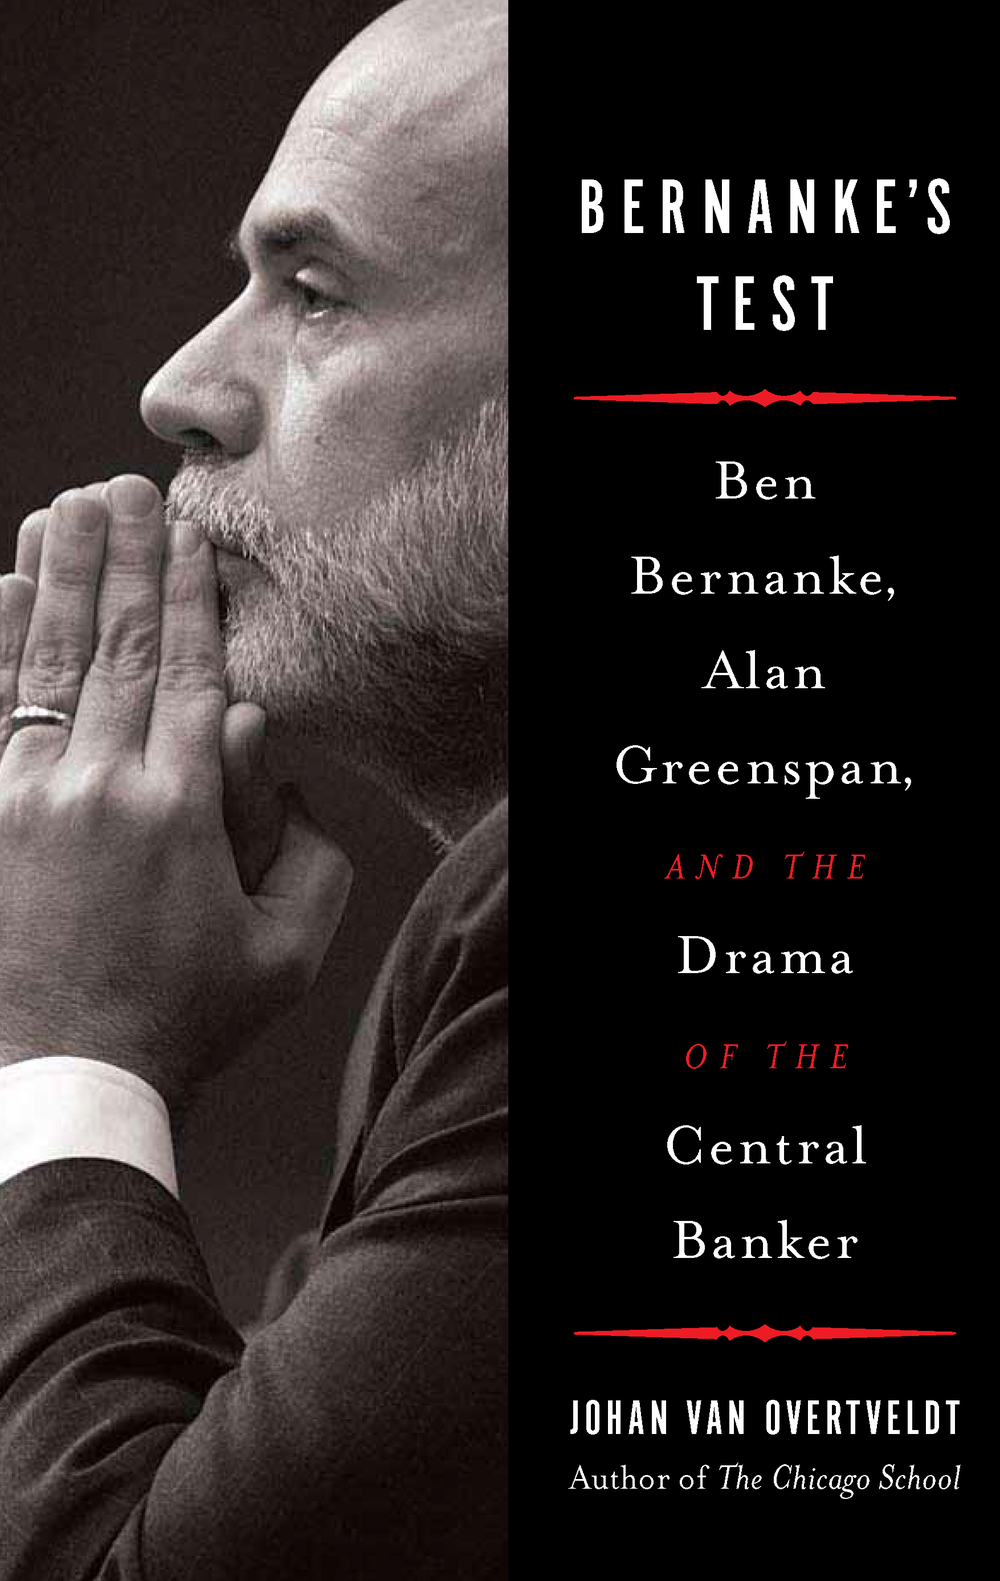 Bernanke's Test_Page_01.png